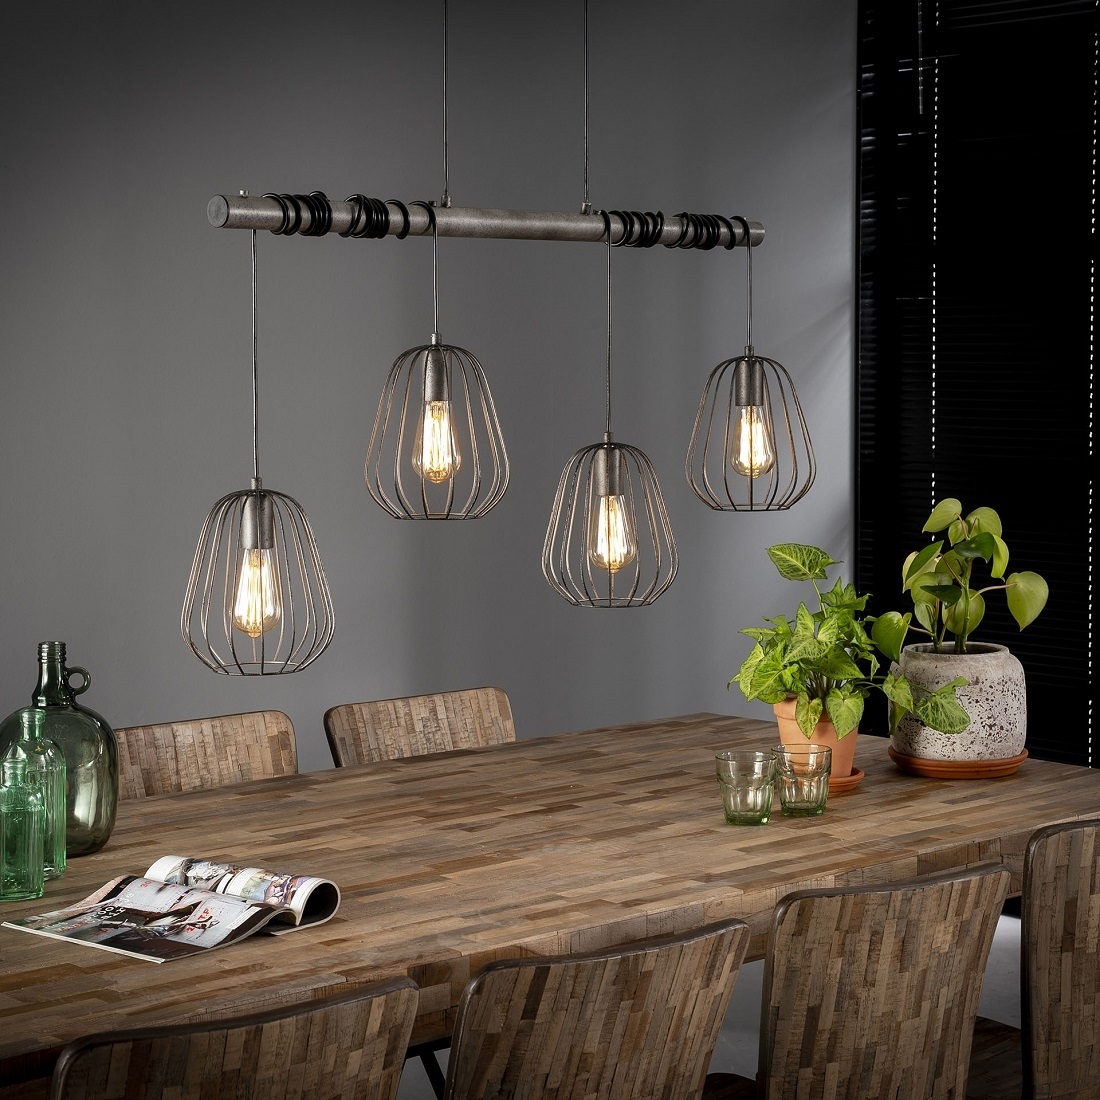 Hanglamp Lampoon 4LxØ18 van 100 cm breed – Zilver | Zaloni